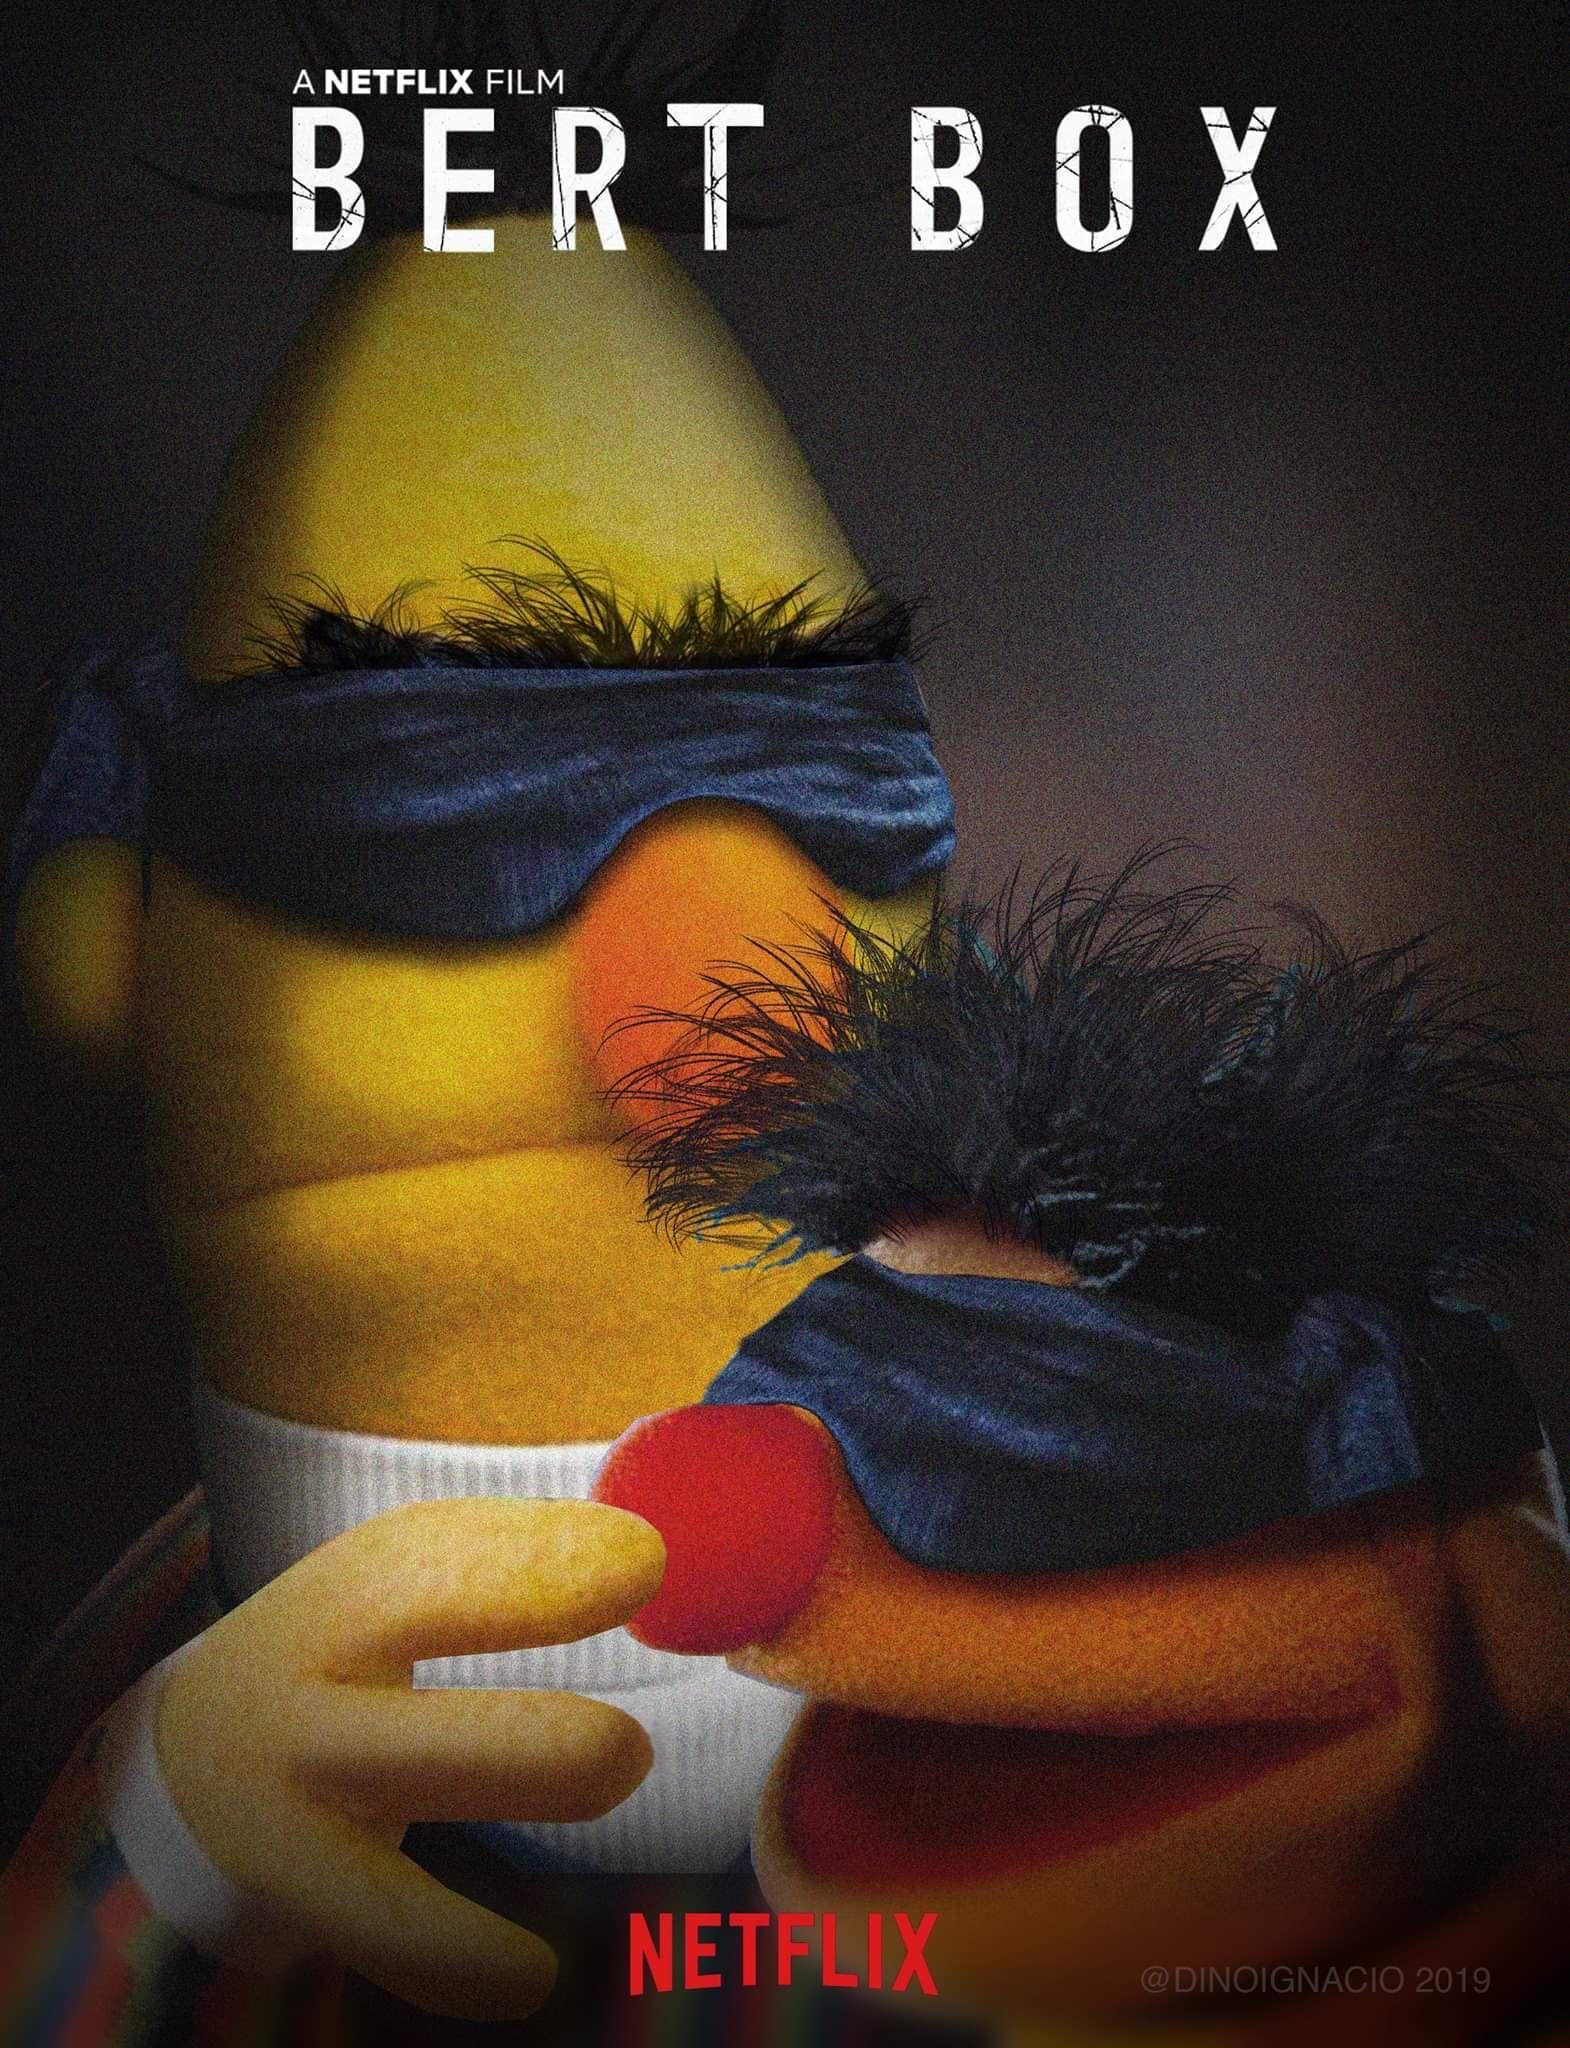 The next big movie: Bert box